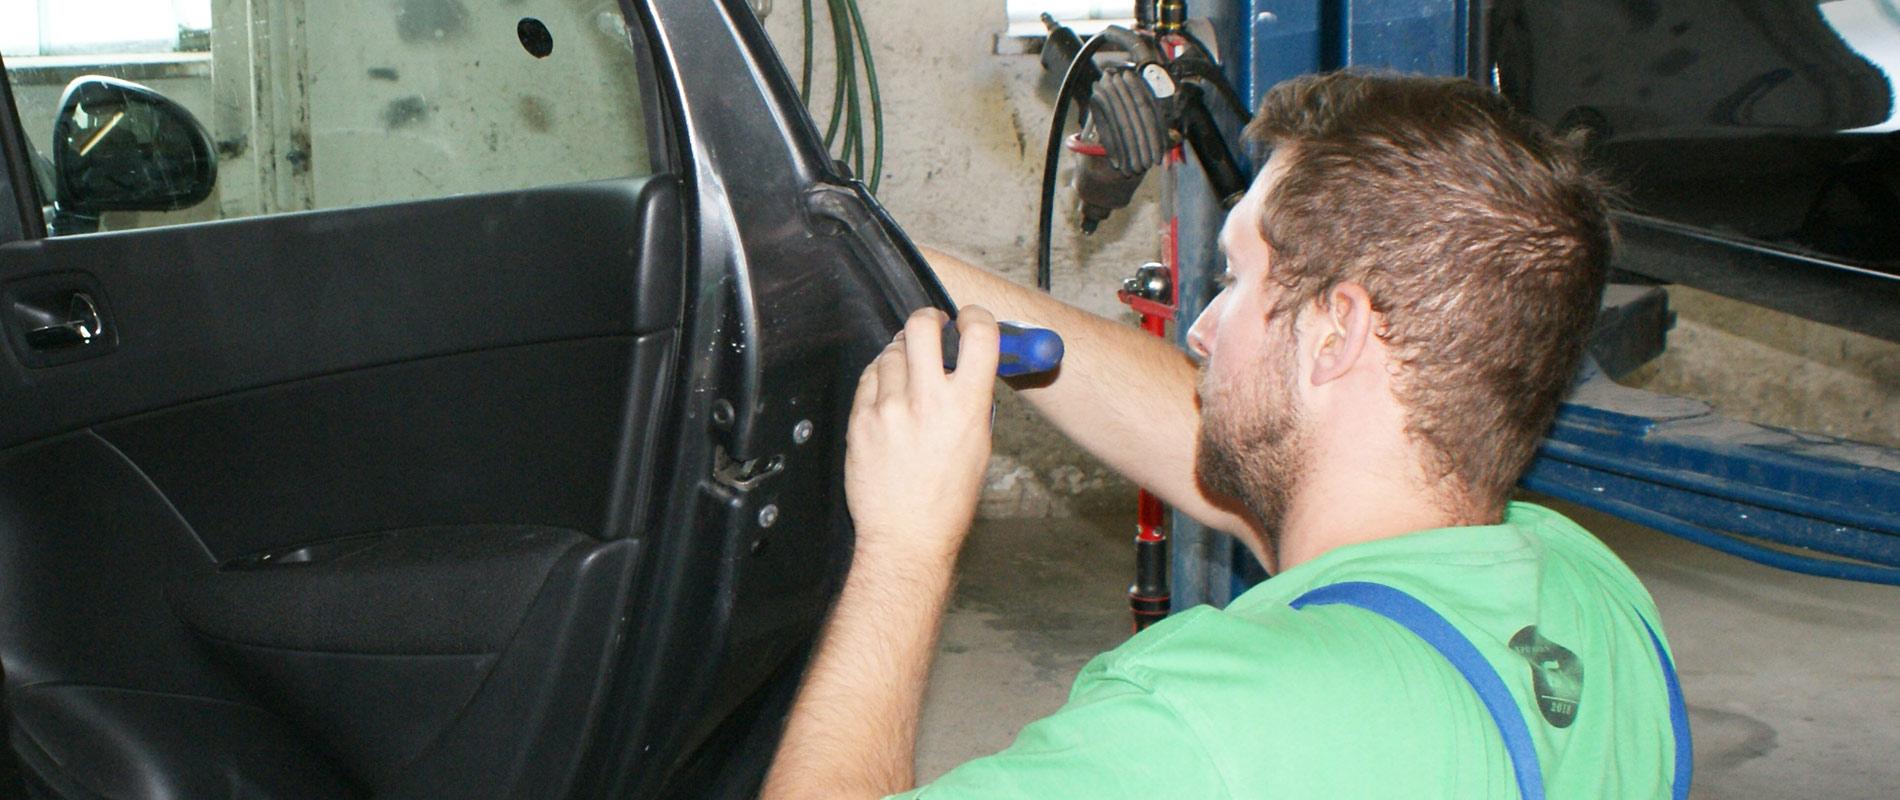 Ronald Penz bei Reparaturarbeiten